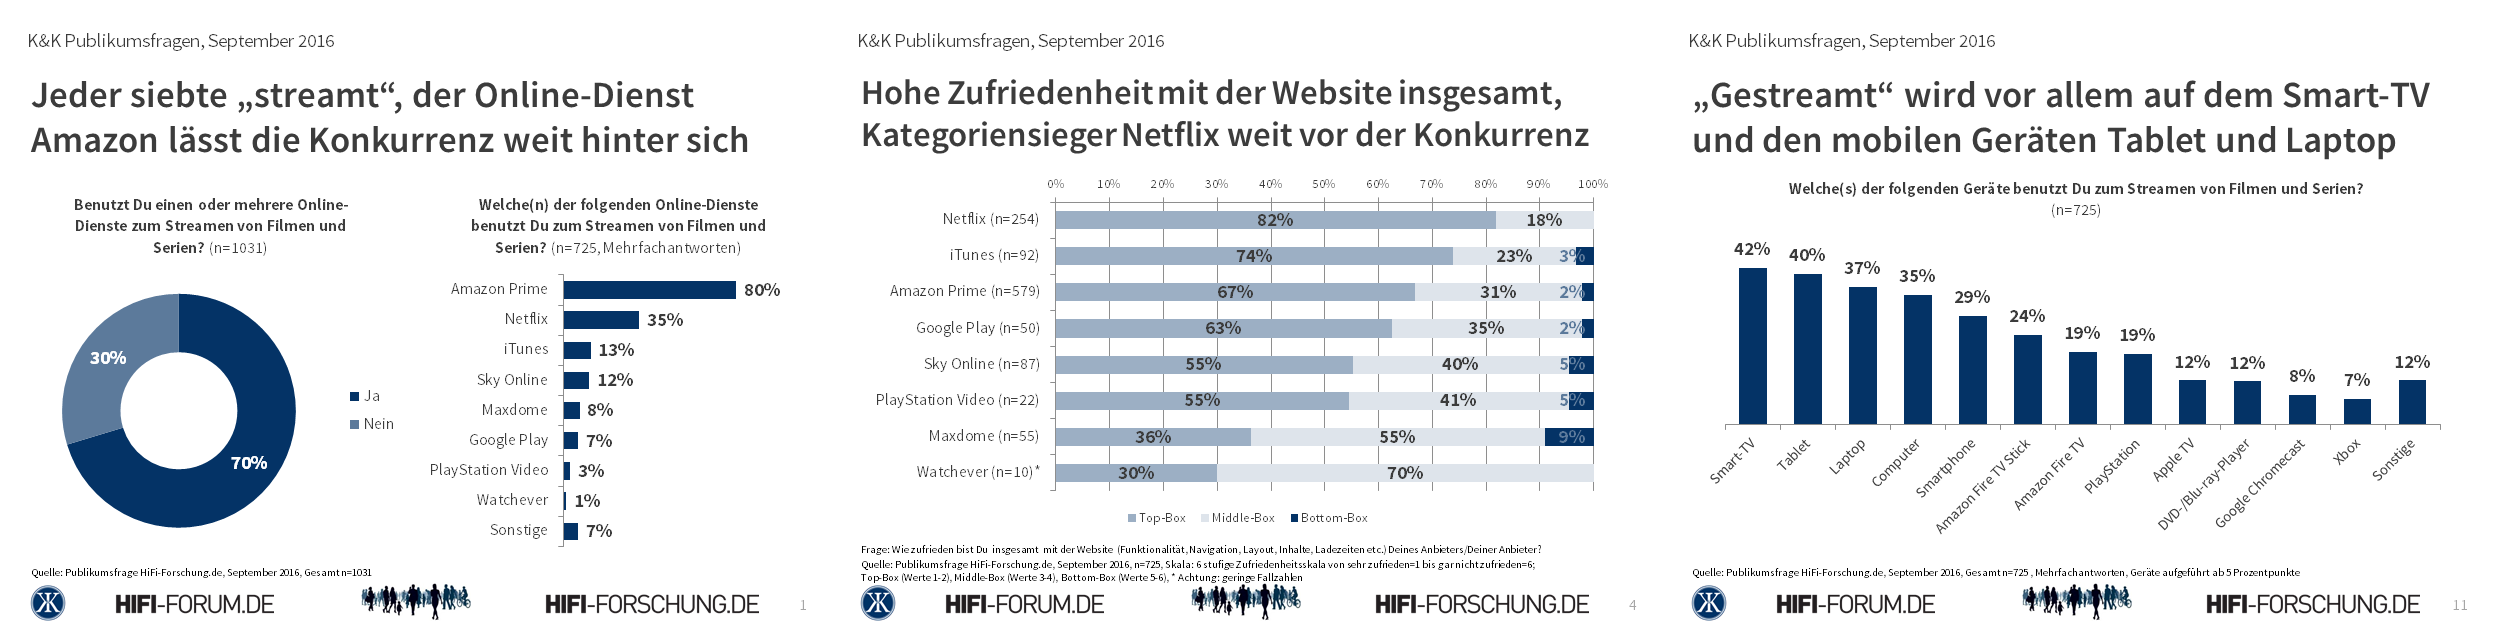 HiFi-Forschung Publikumsfrage Streaming